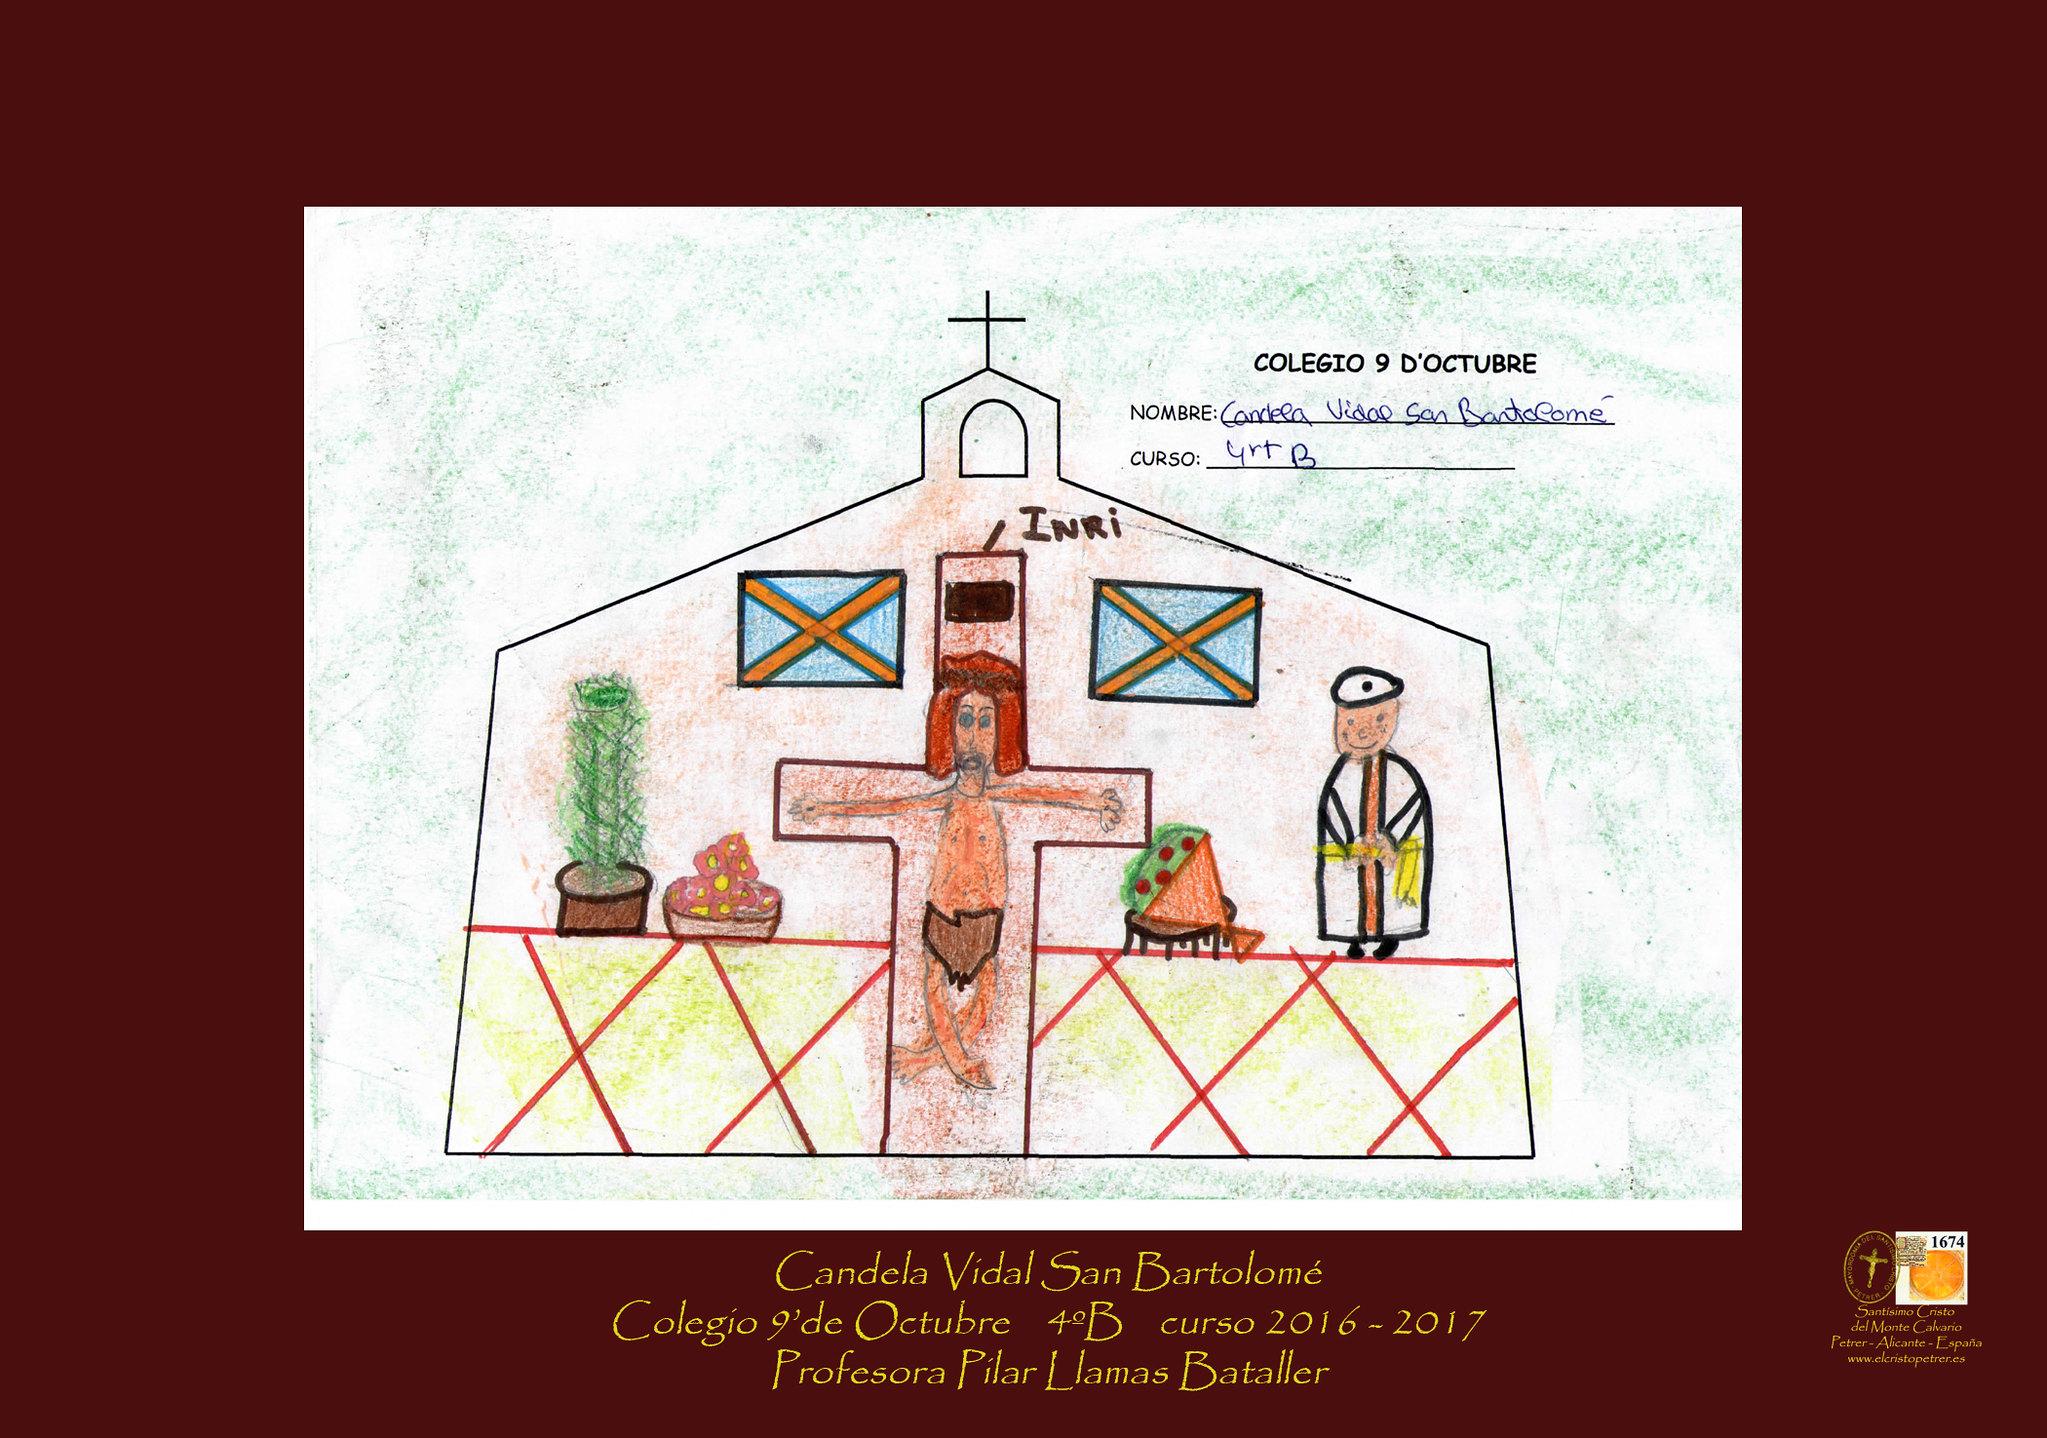 ElCristo - Actos - Exposicion Fotografica - (2017-12-01) - 9 D'Octubre - 4ºB - Vidal San Bartolomé, Candela